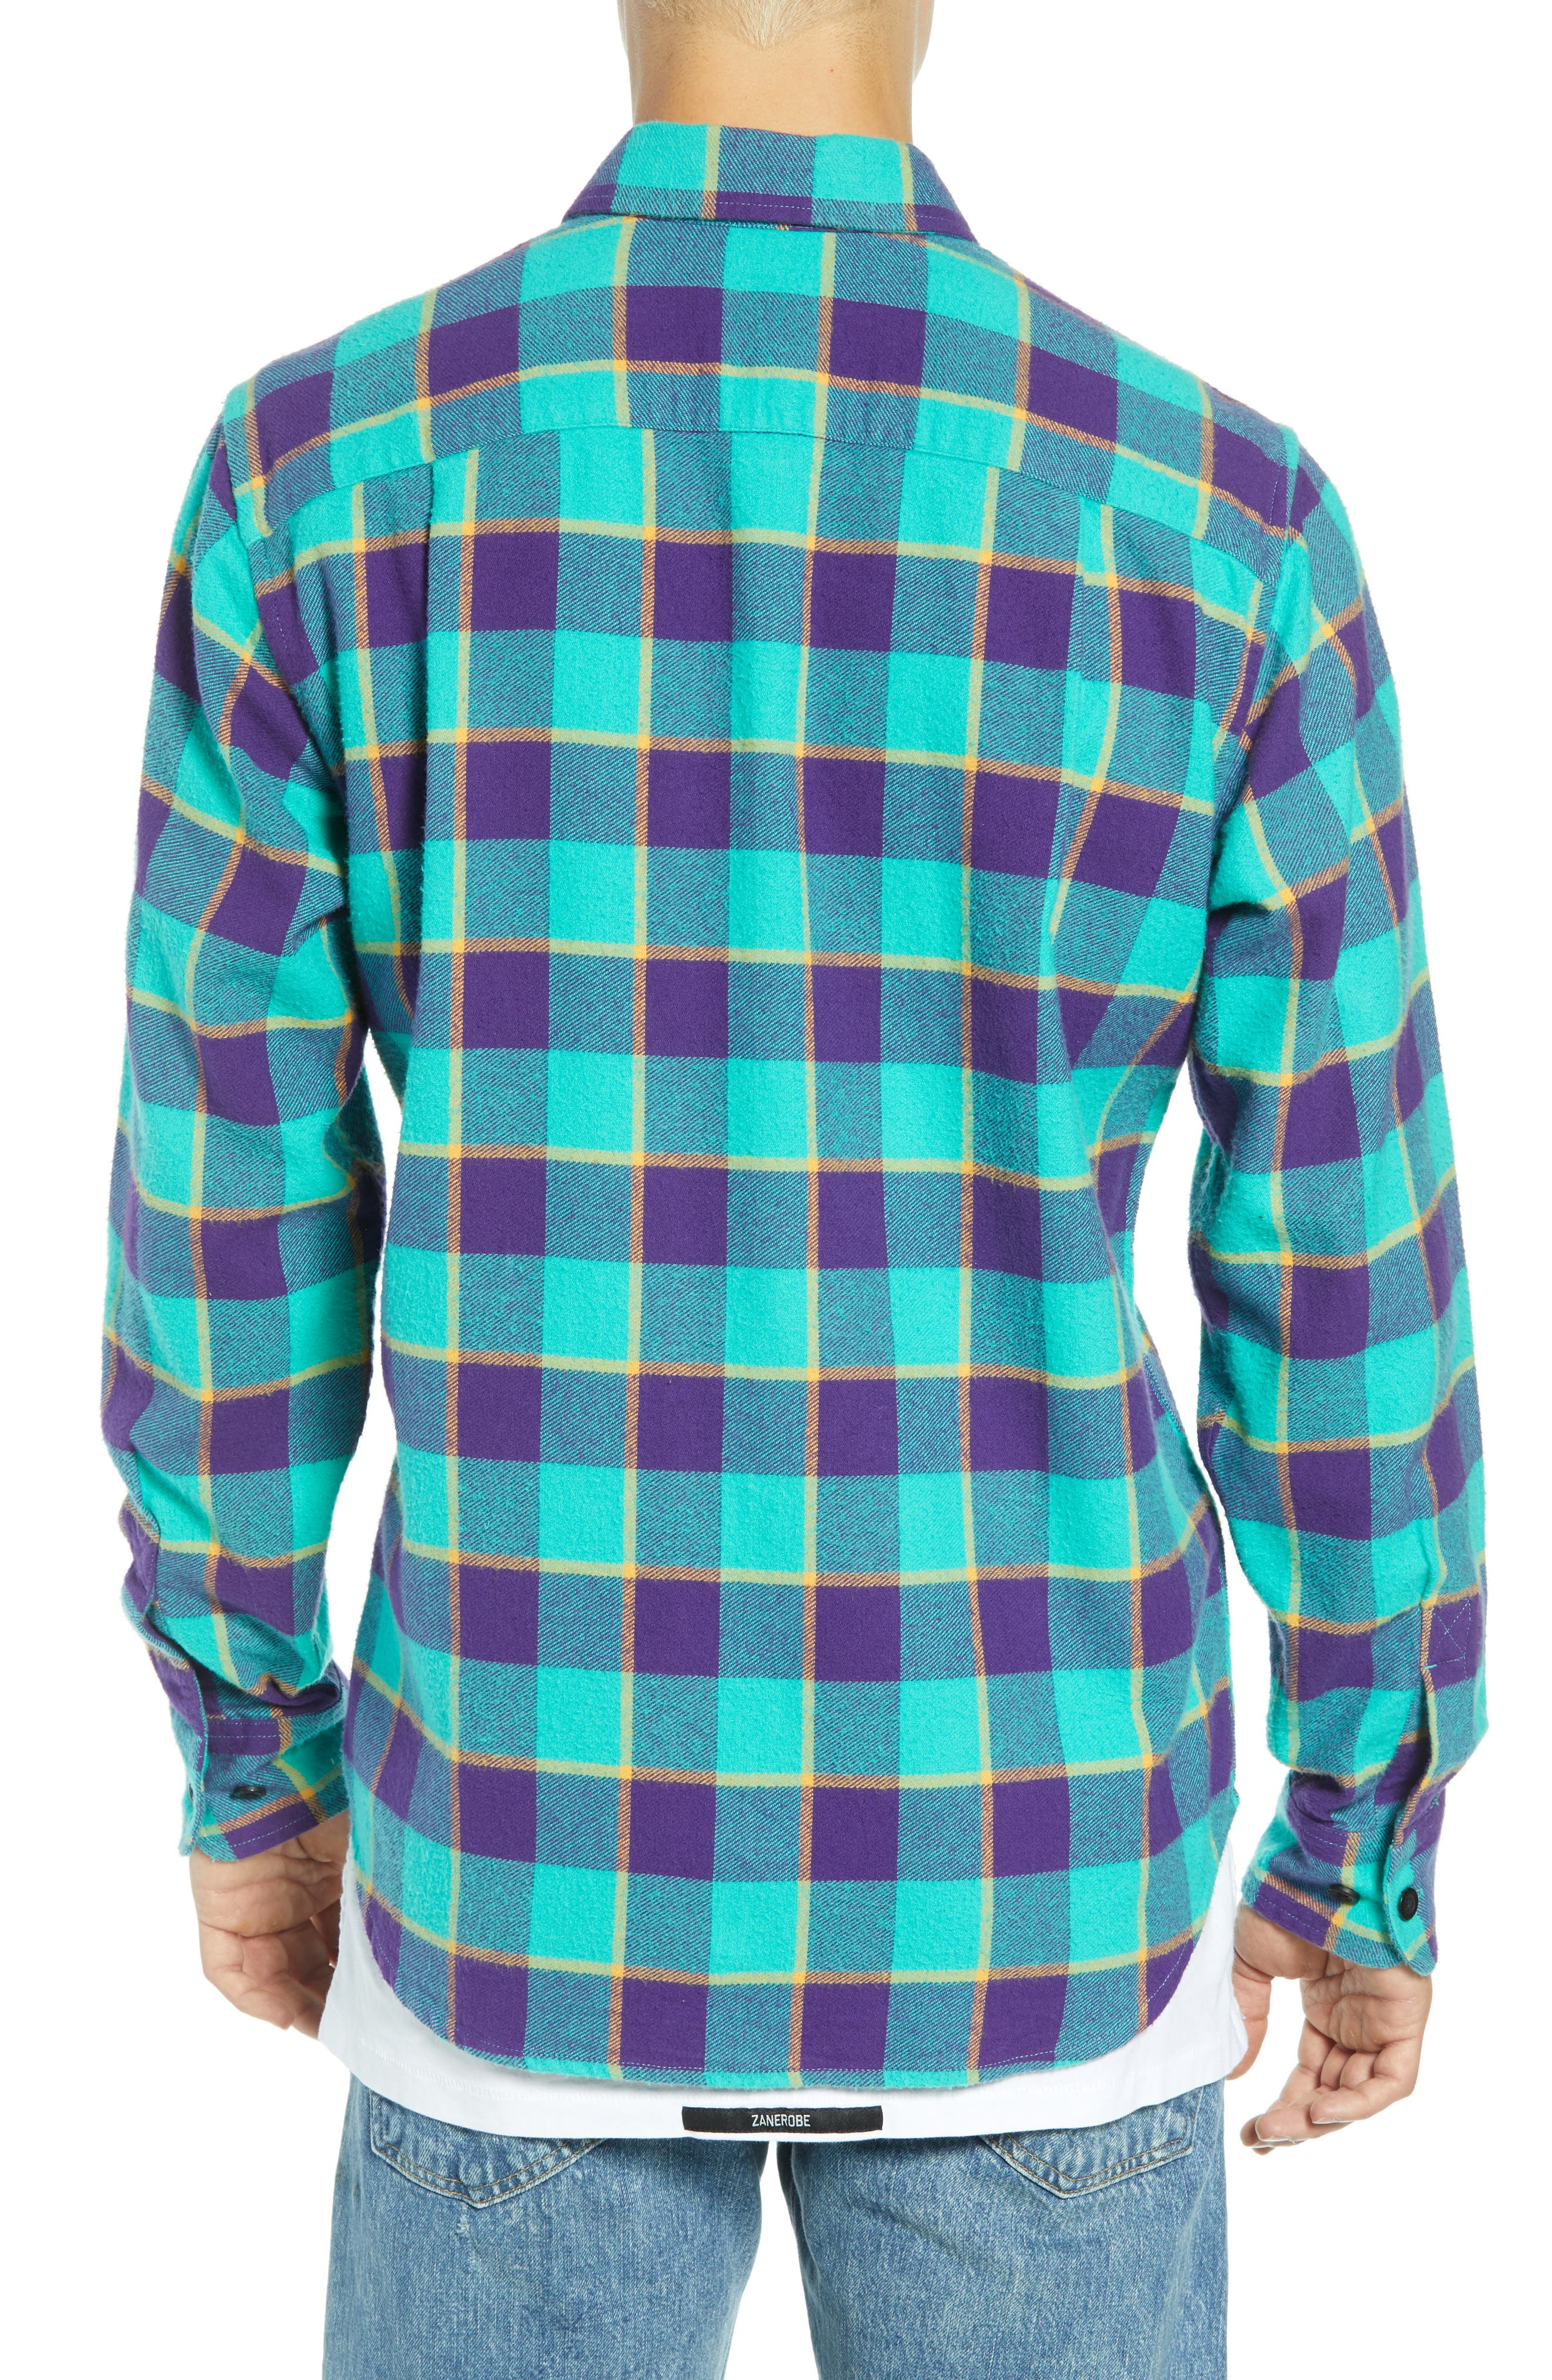 Ventura Plaid Flannel Shirt,                             Alternate thumbnail 3, color,                             TEAL MULTI